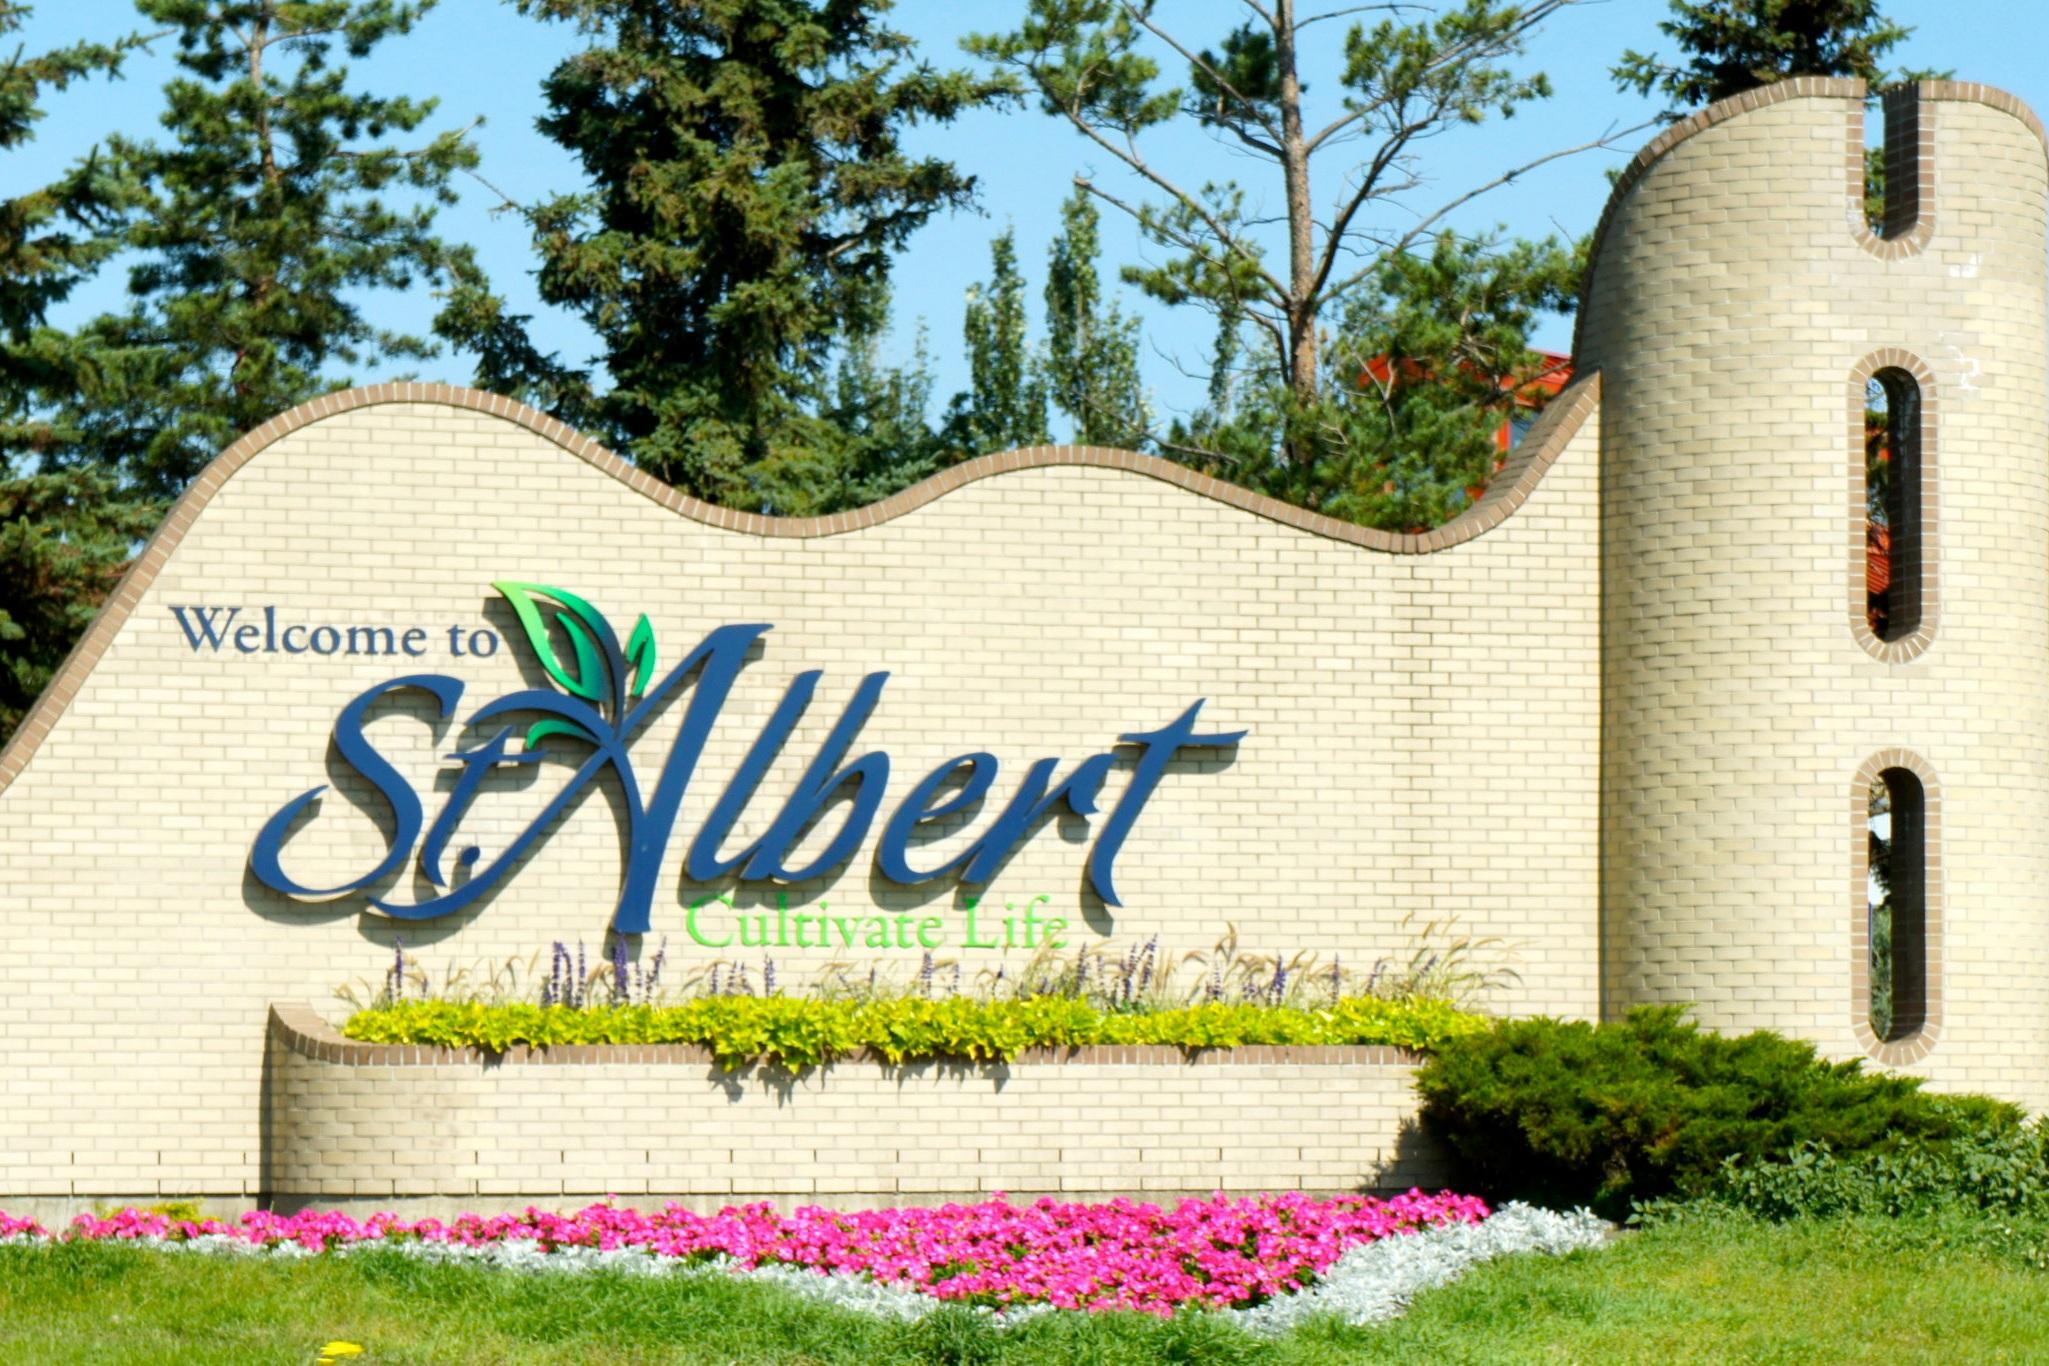 ST. ALBERT -